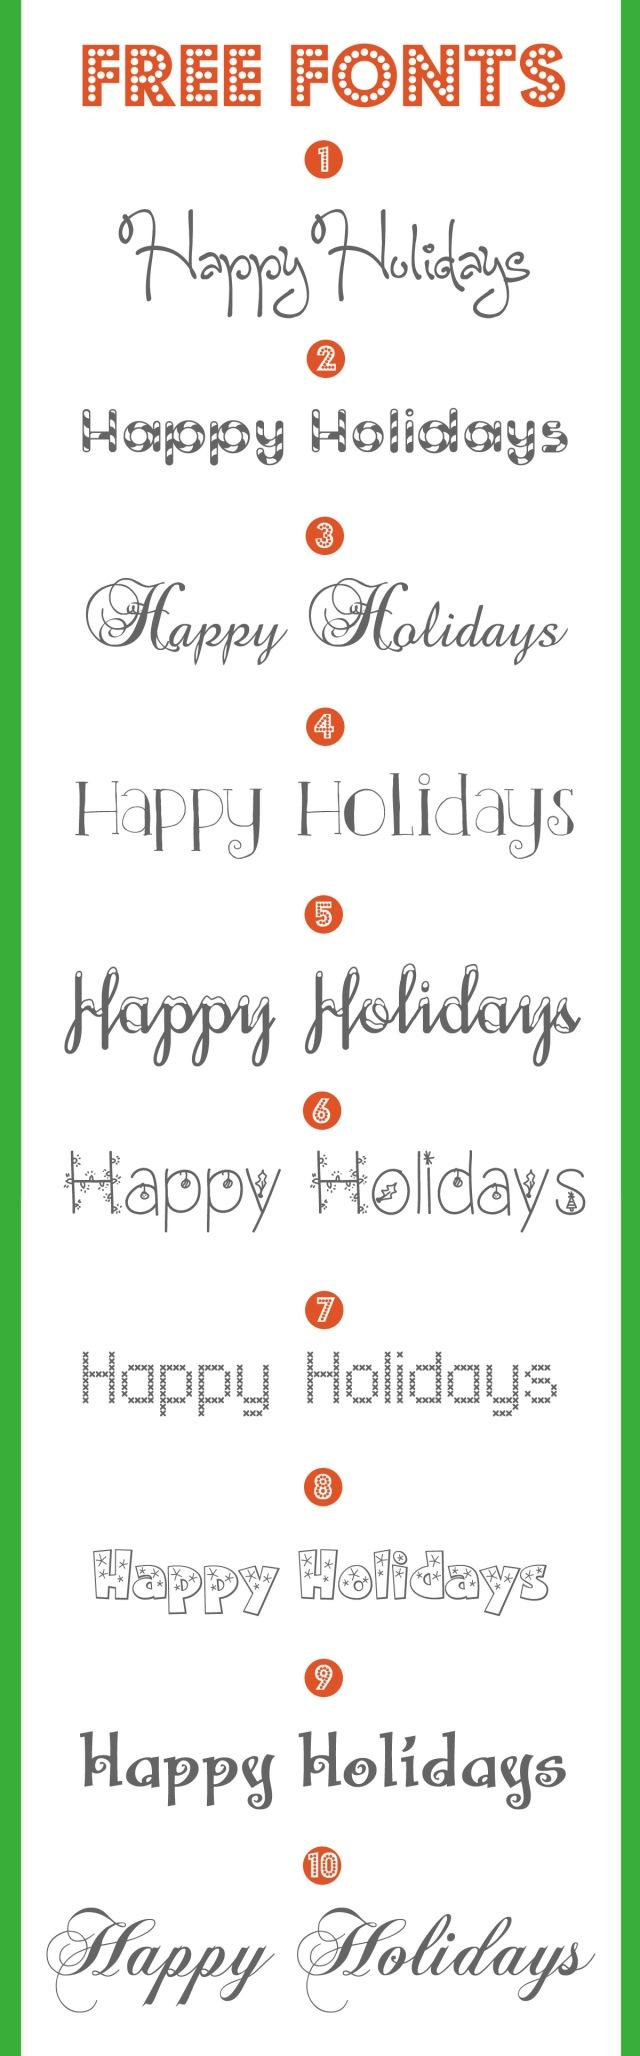 Holiday_2012FREEFONTS